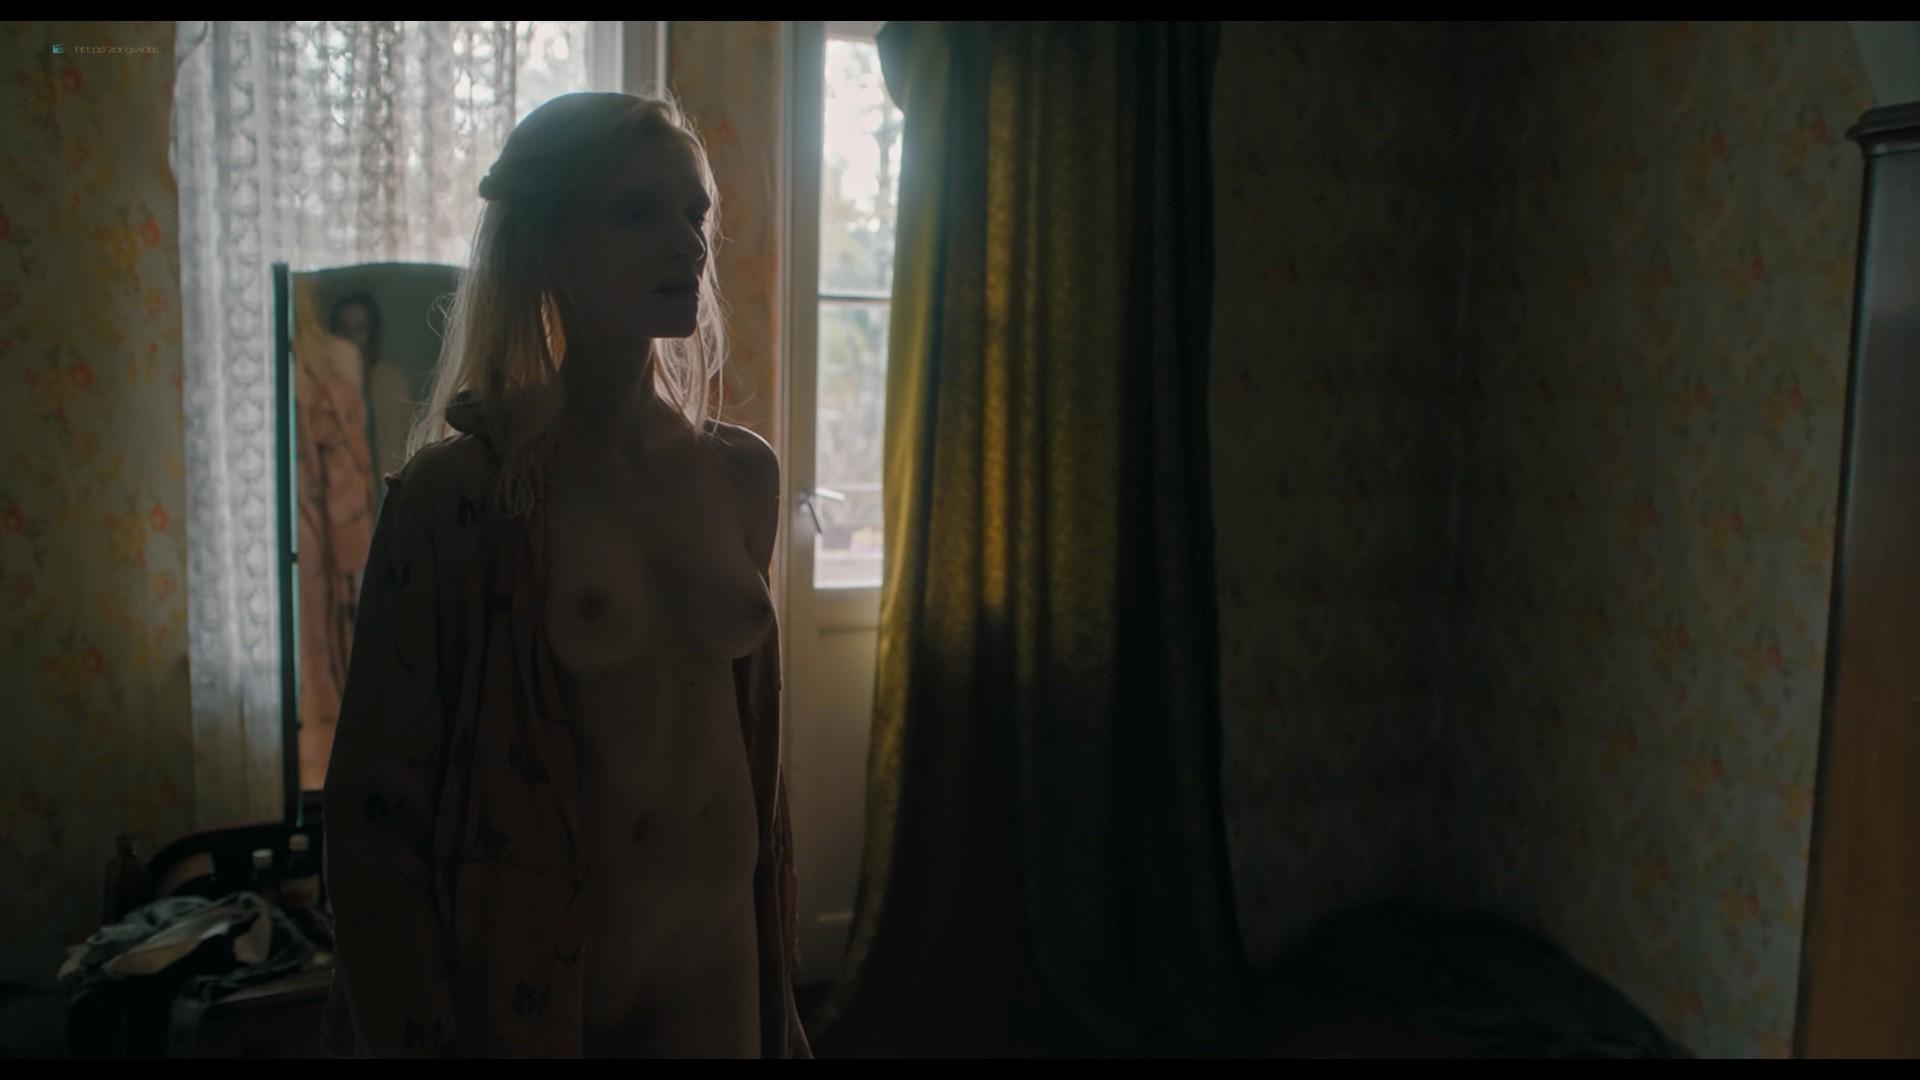 Magdalena Cielecka nude sex Roma Gasiorowska nude too - Dark, Almost Night (PL-2019) HD 1080p BluRay (9)